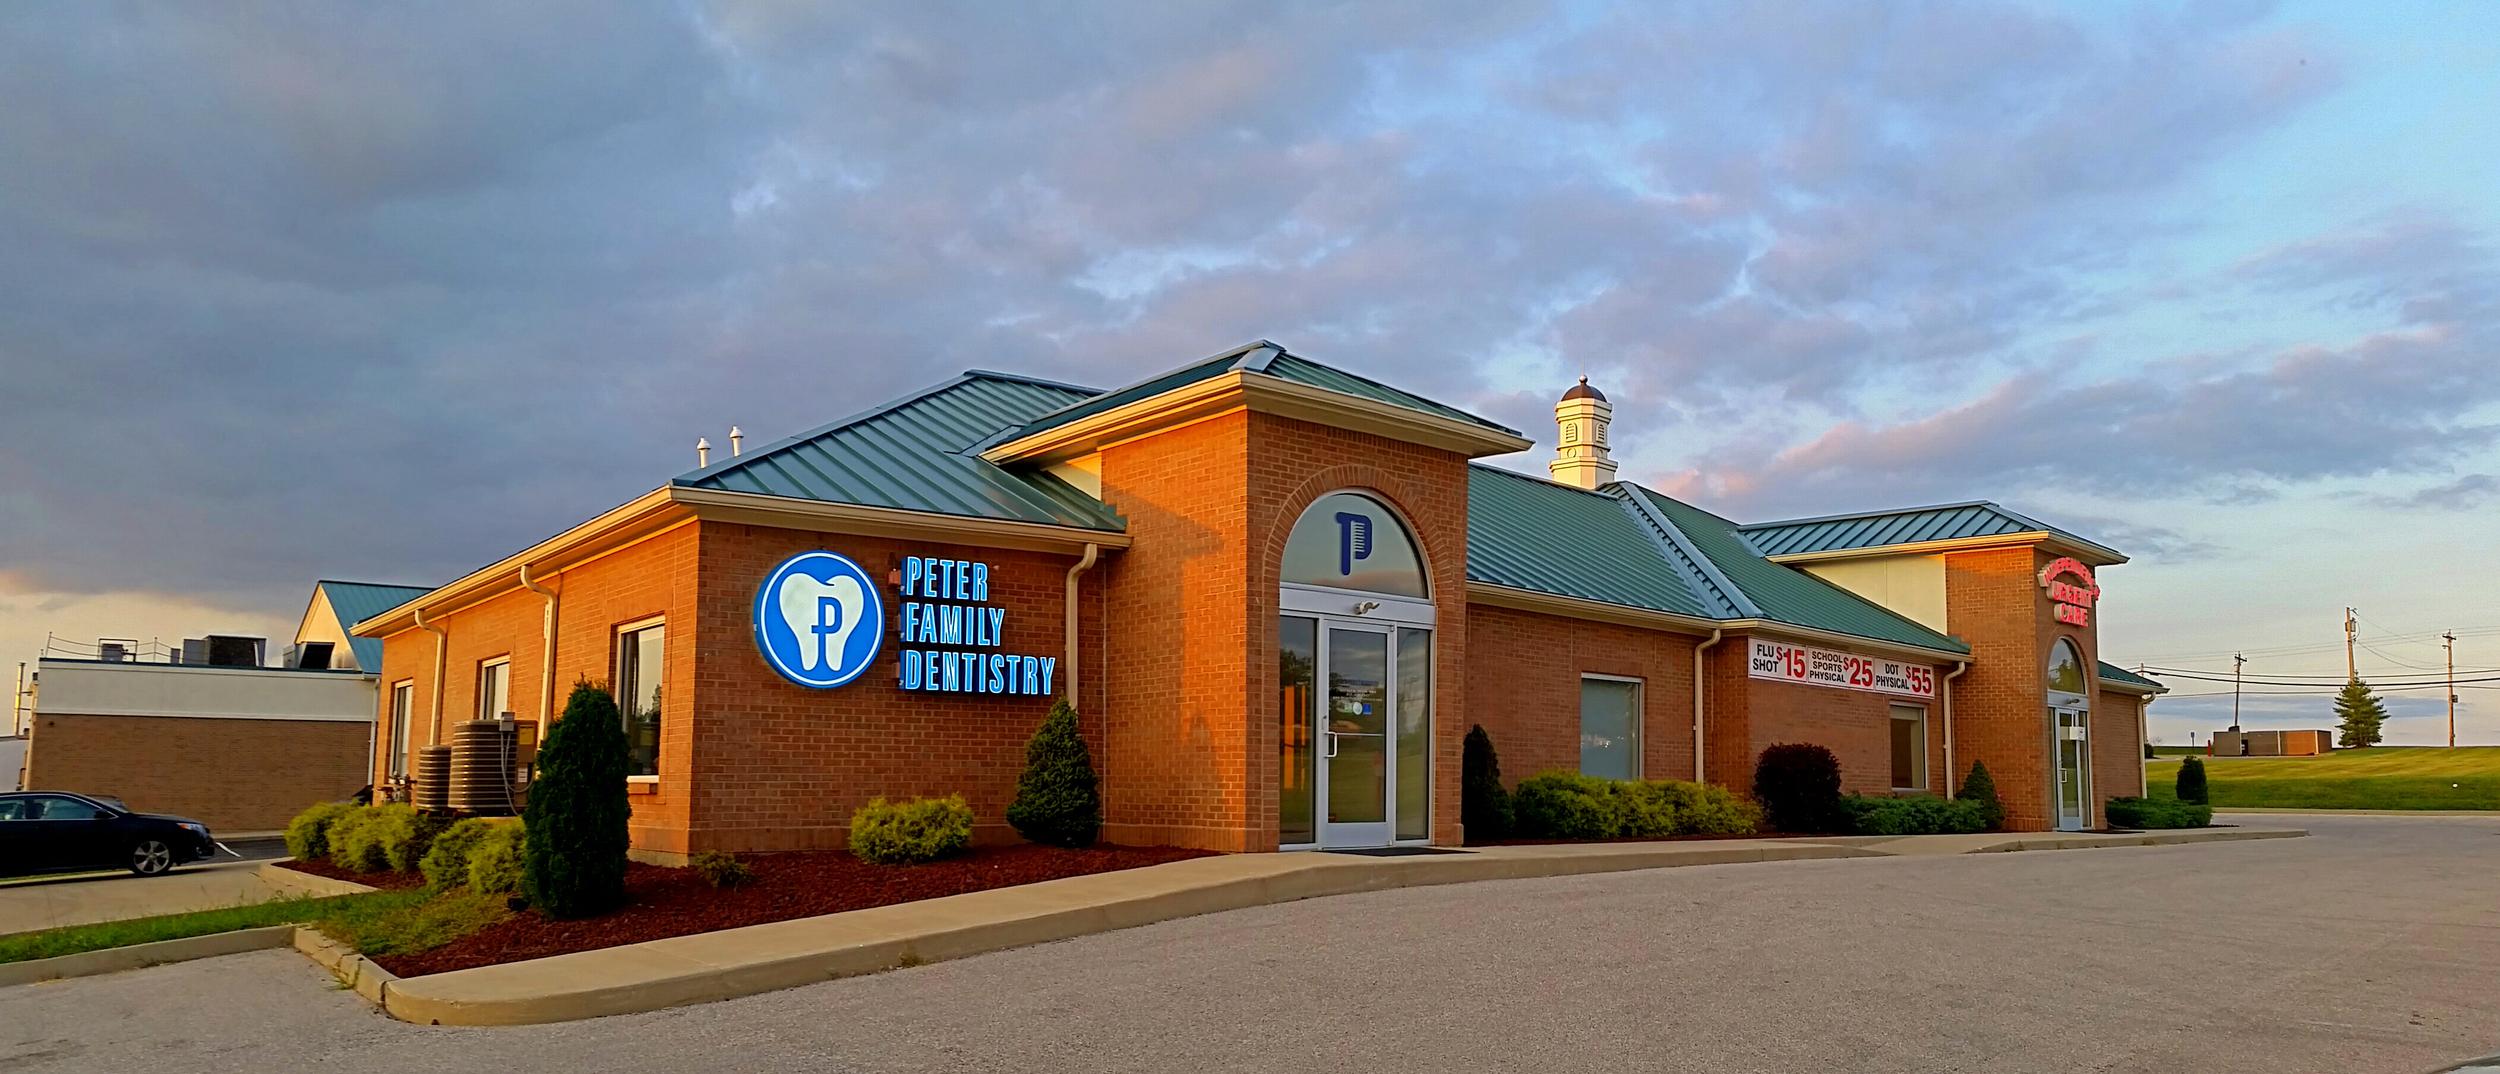 Peter Family Dentistry Exterior